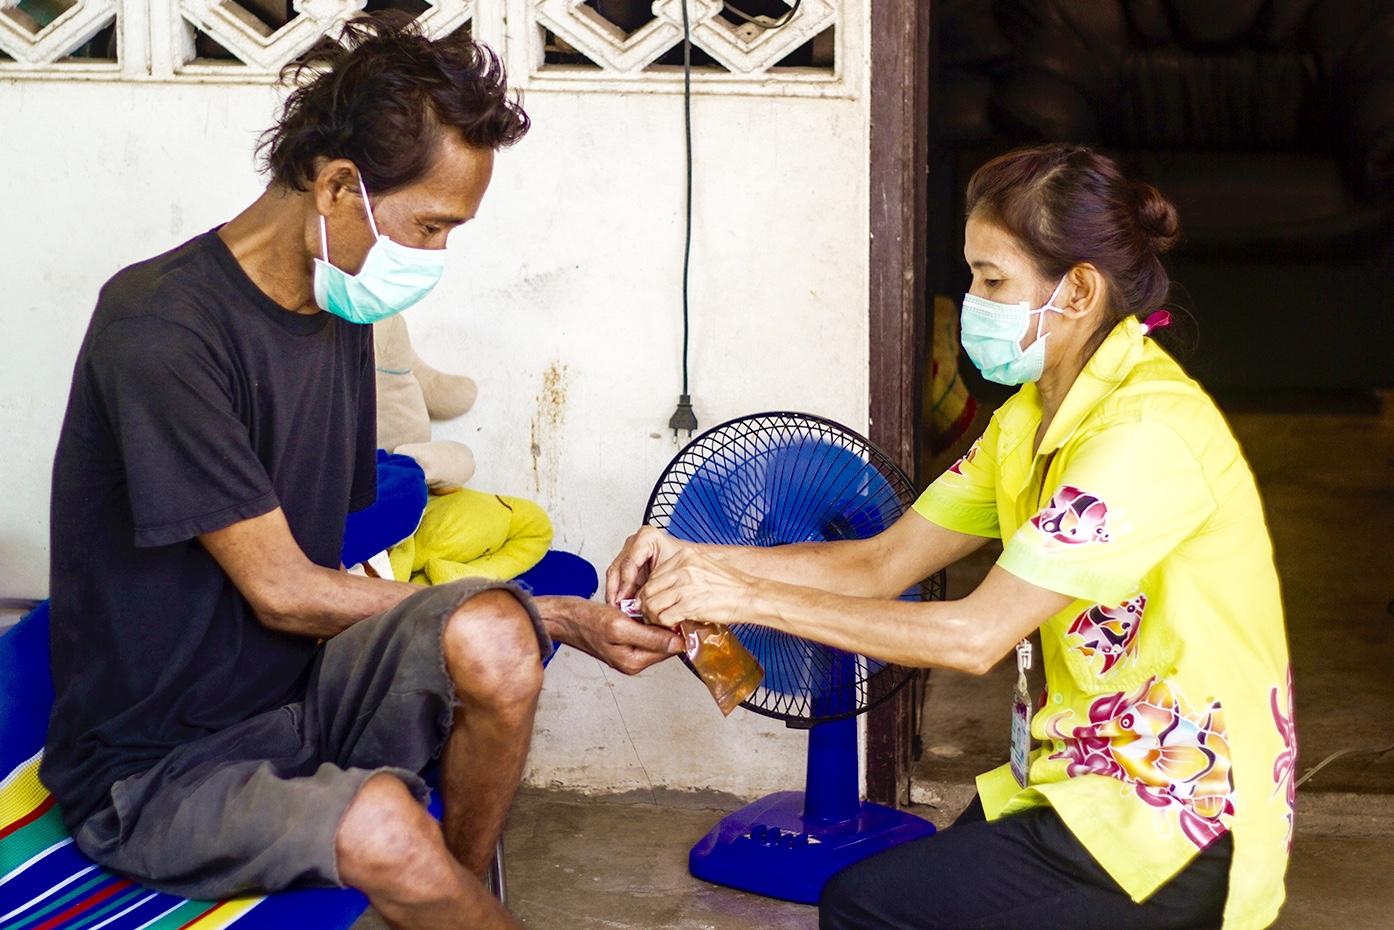 USAID Asia CC BY-NC 2.0